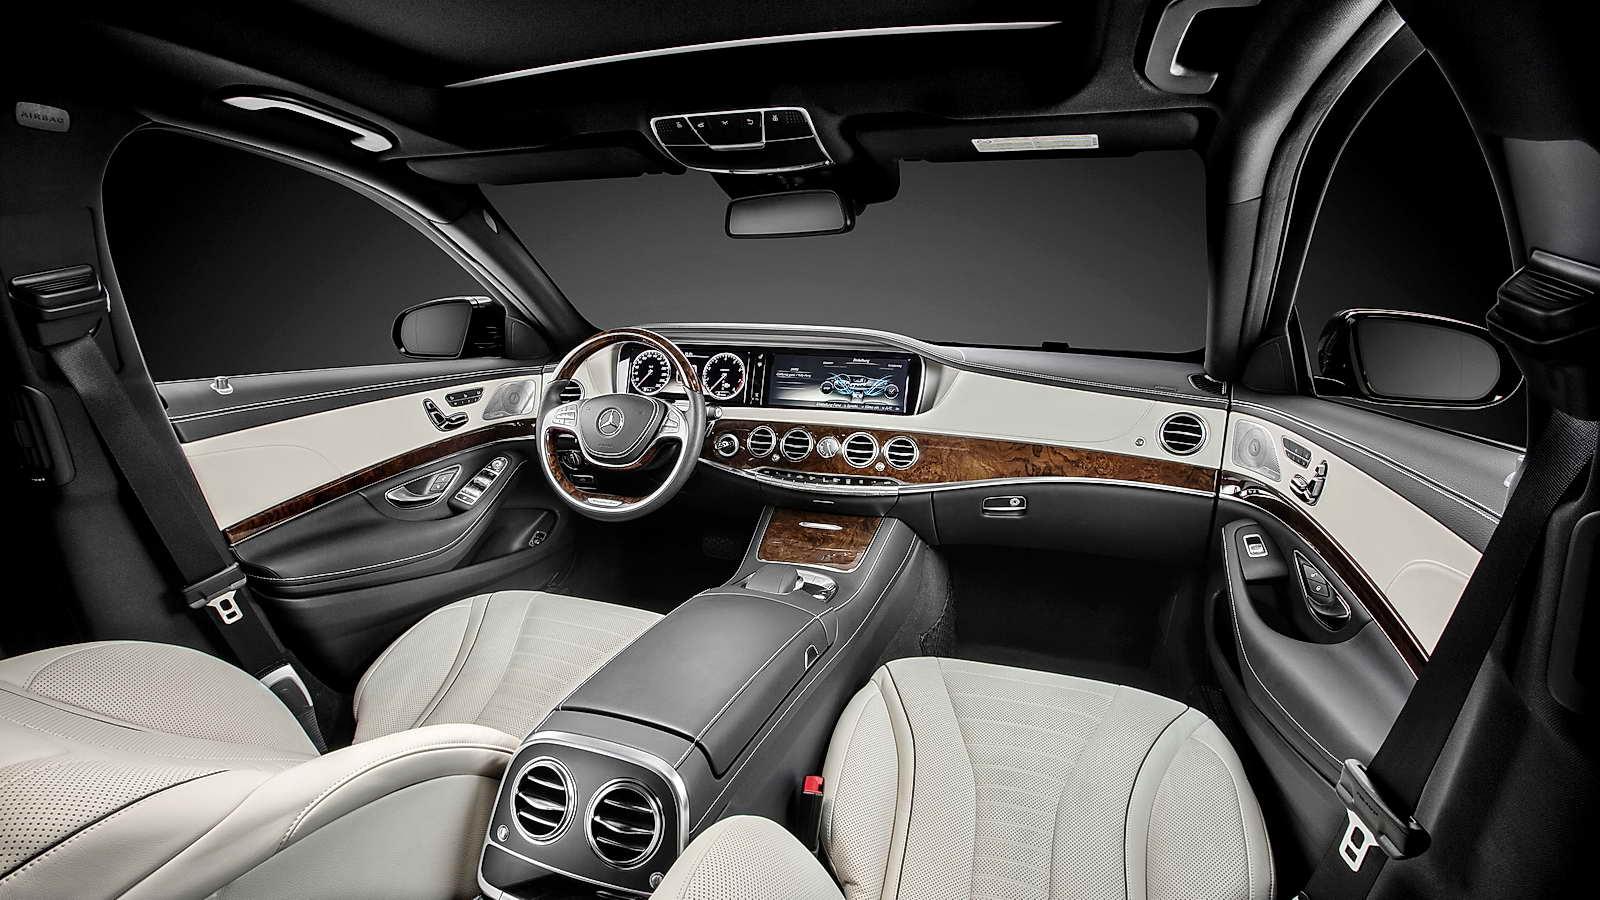 Mercedes-Benz Clase S: ¿el mejor automóvil del mundo?